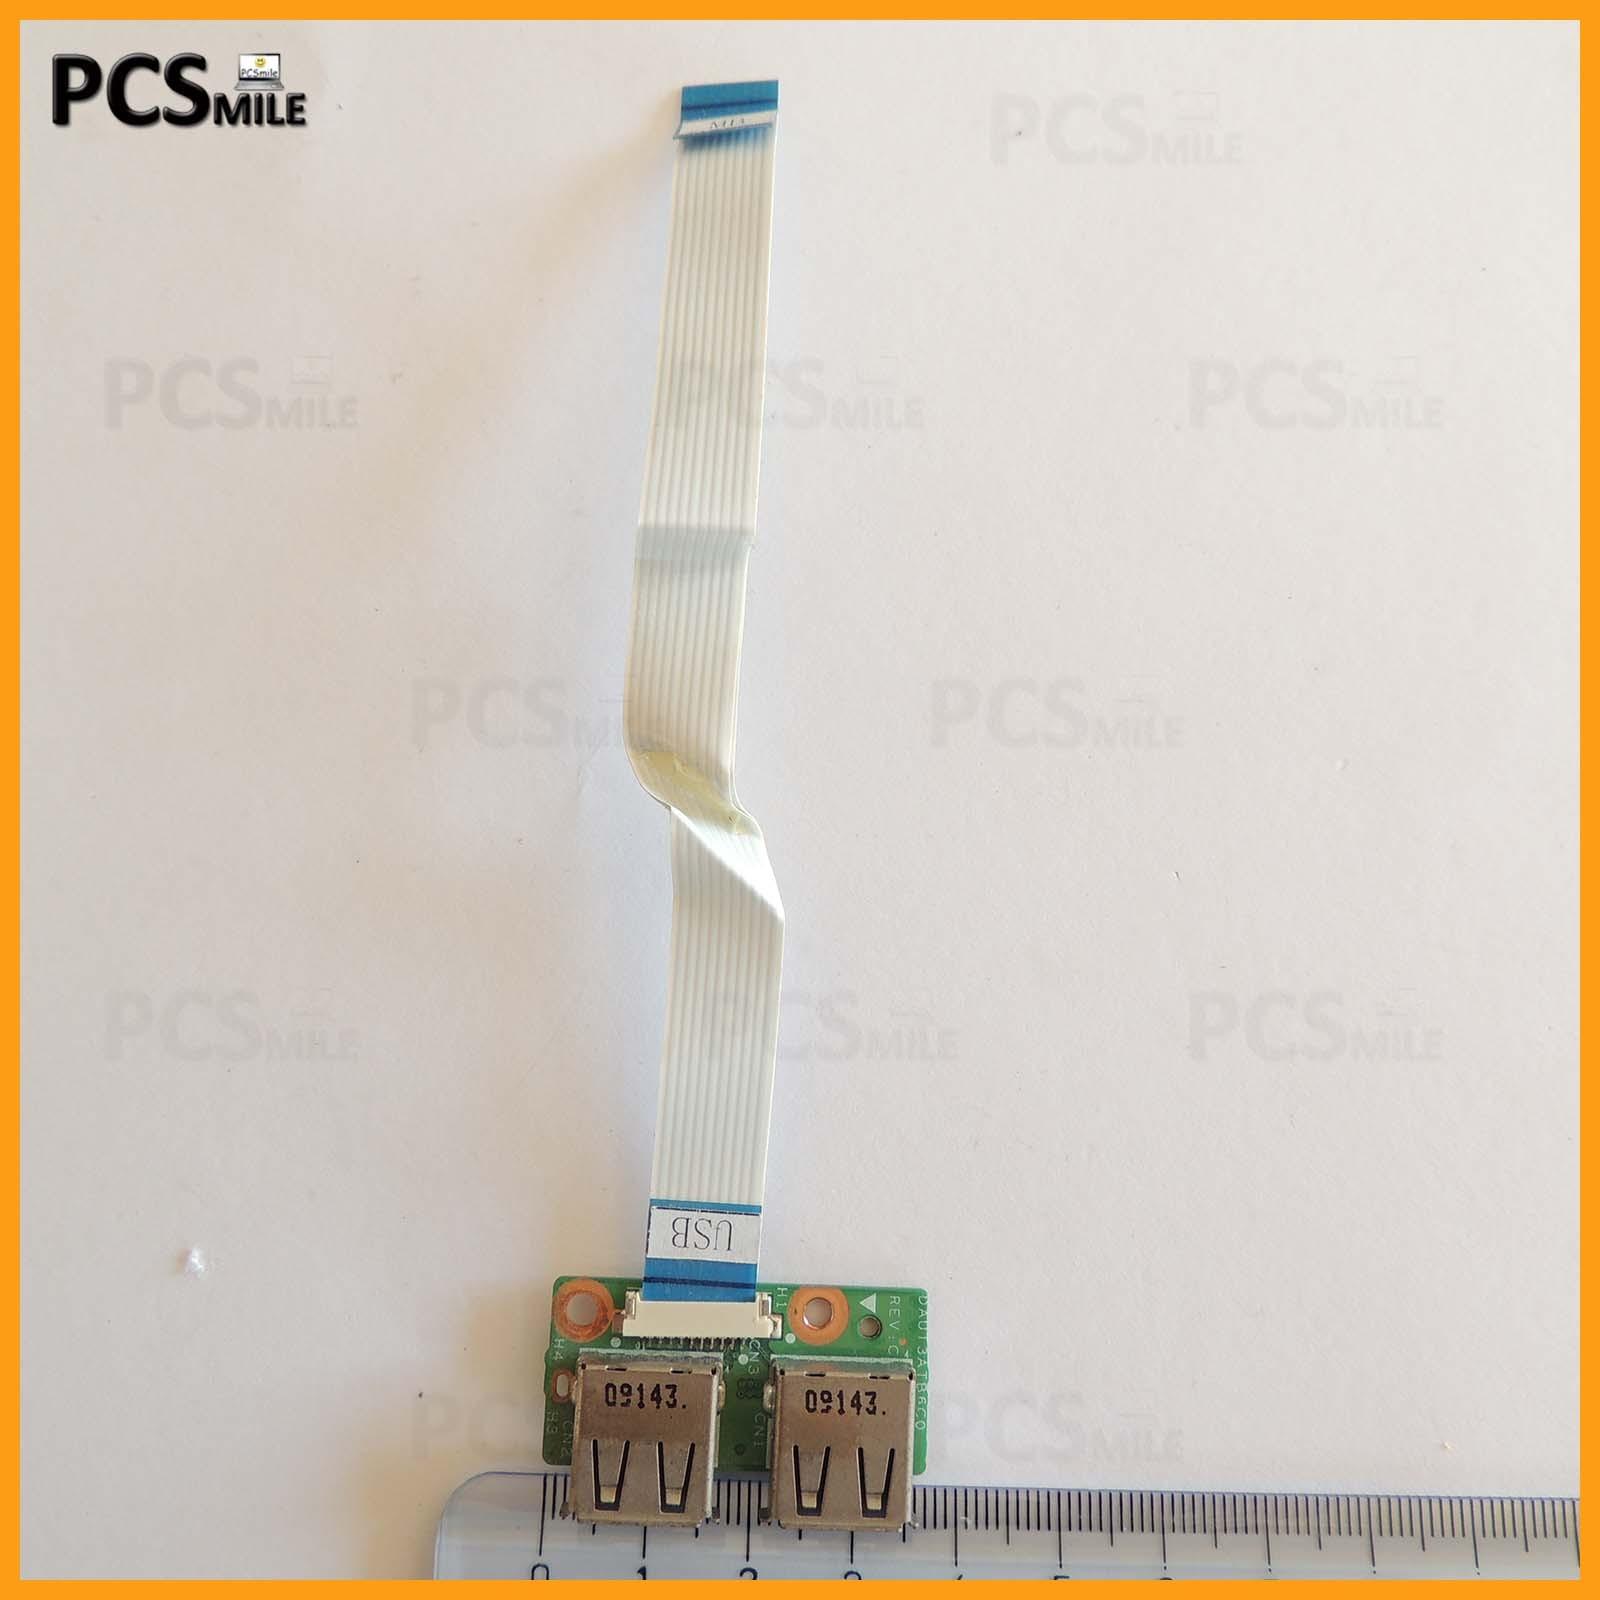 Porte USB Board scheda DAUT3ATB6CO HP DV6-1114el DV6-1200SL Flat